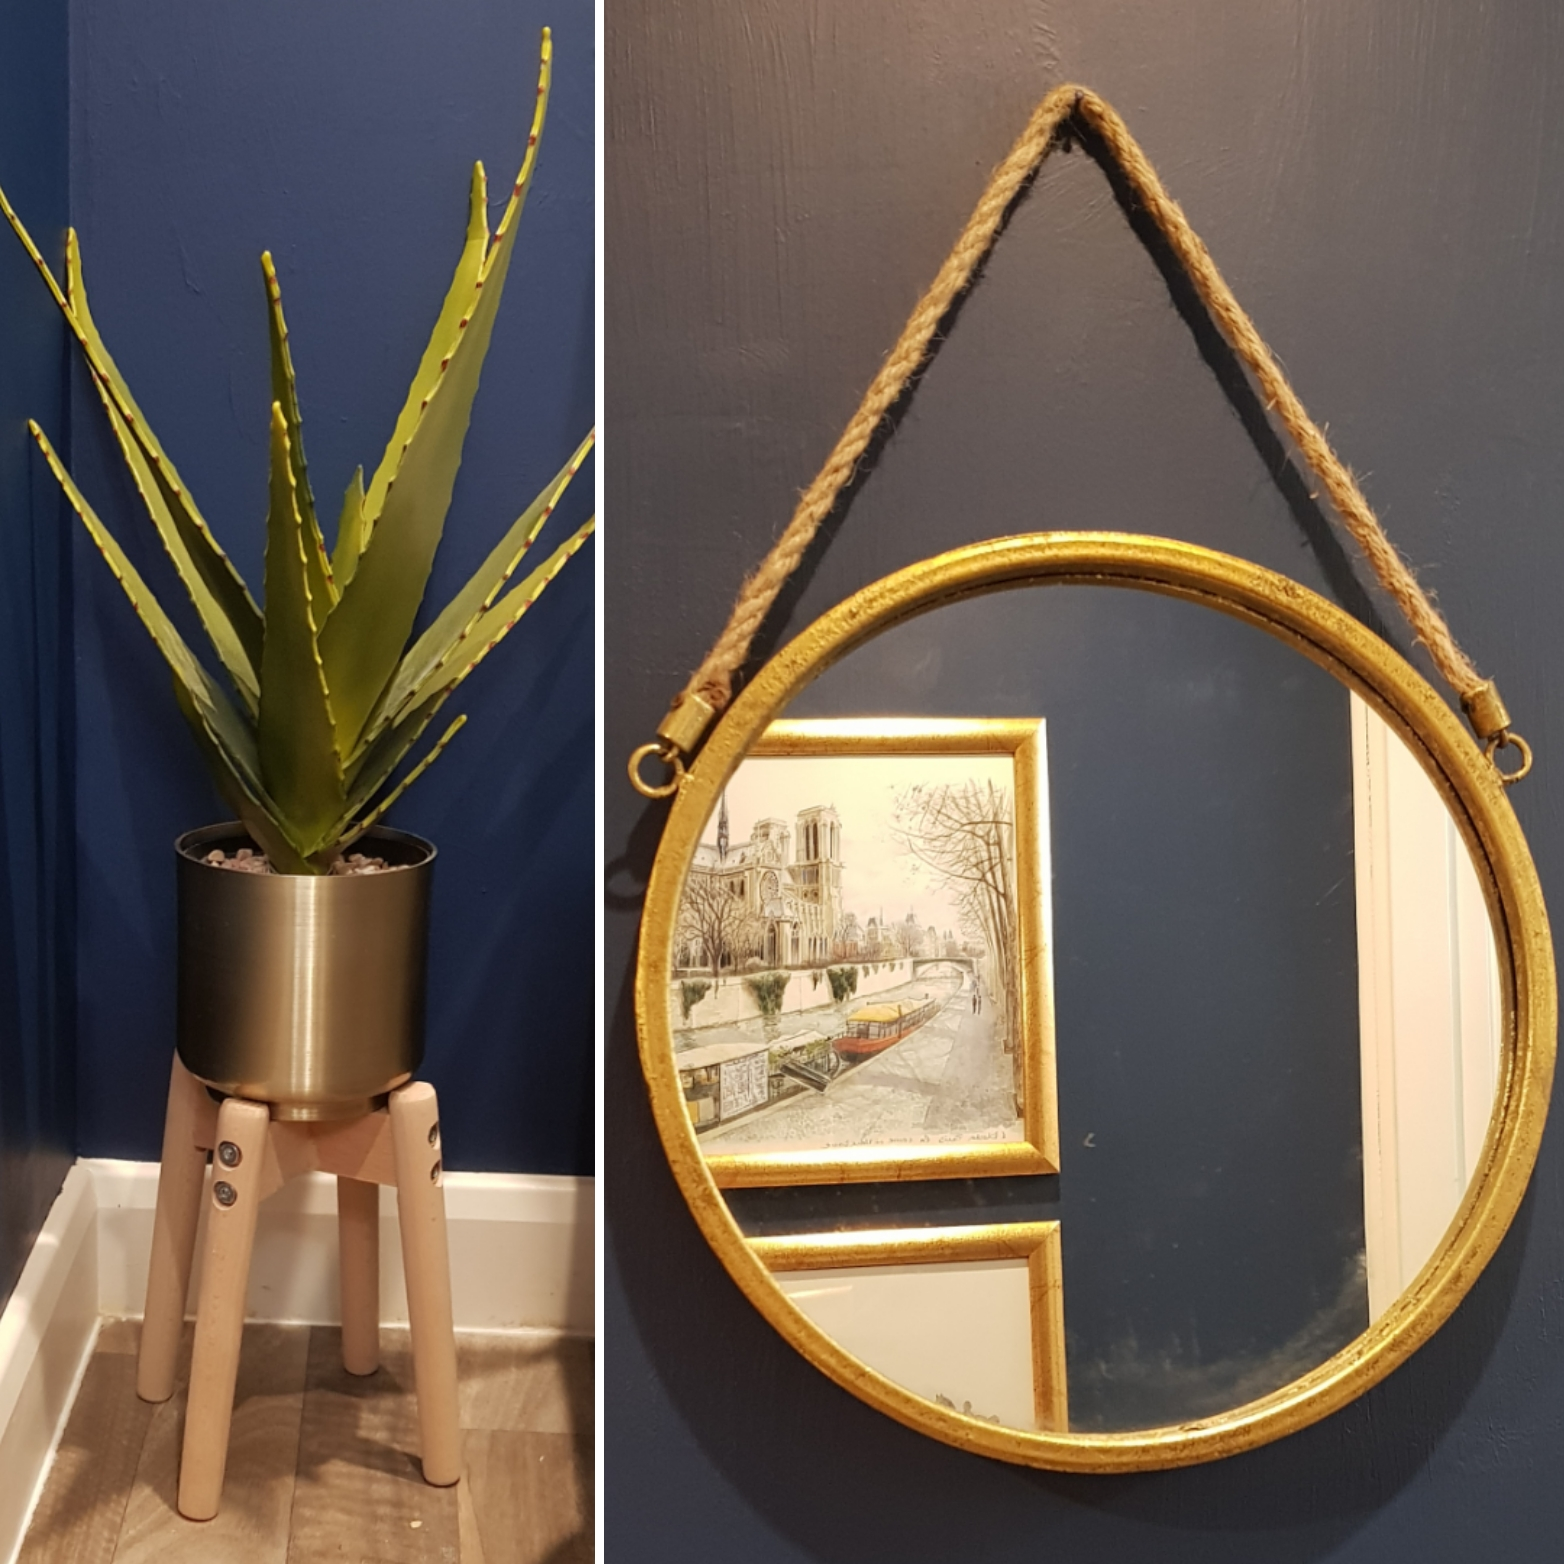 Budget Room Makeover: Plant & Mirror